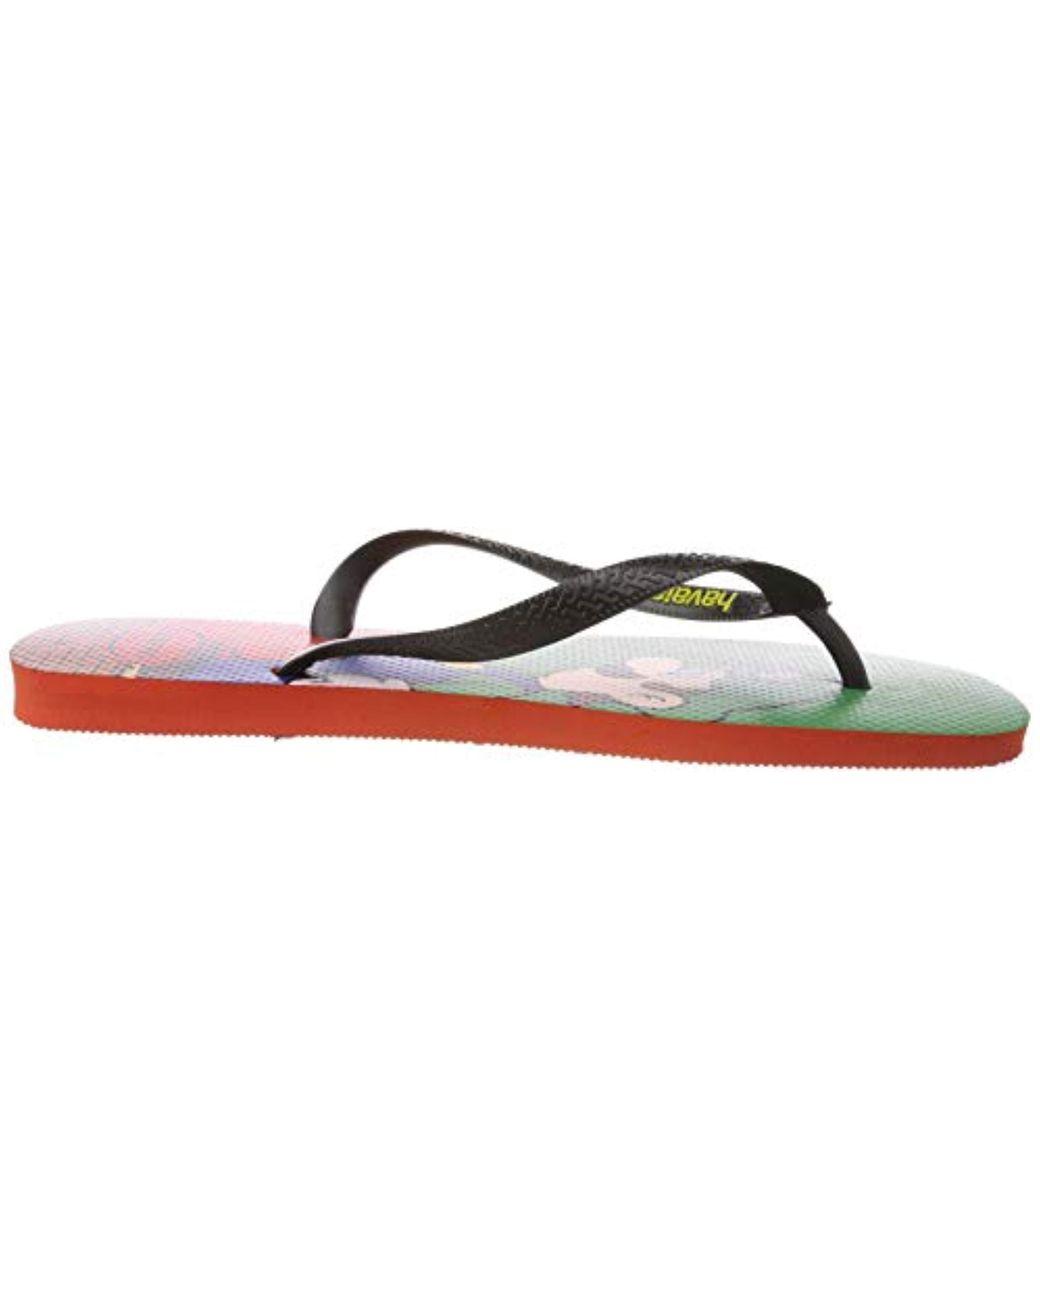 Havaianas Mario Bros Unisex Rubber Sandal In Multi Colo